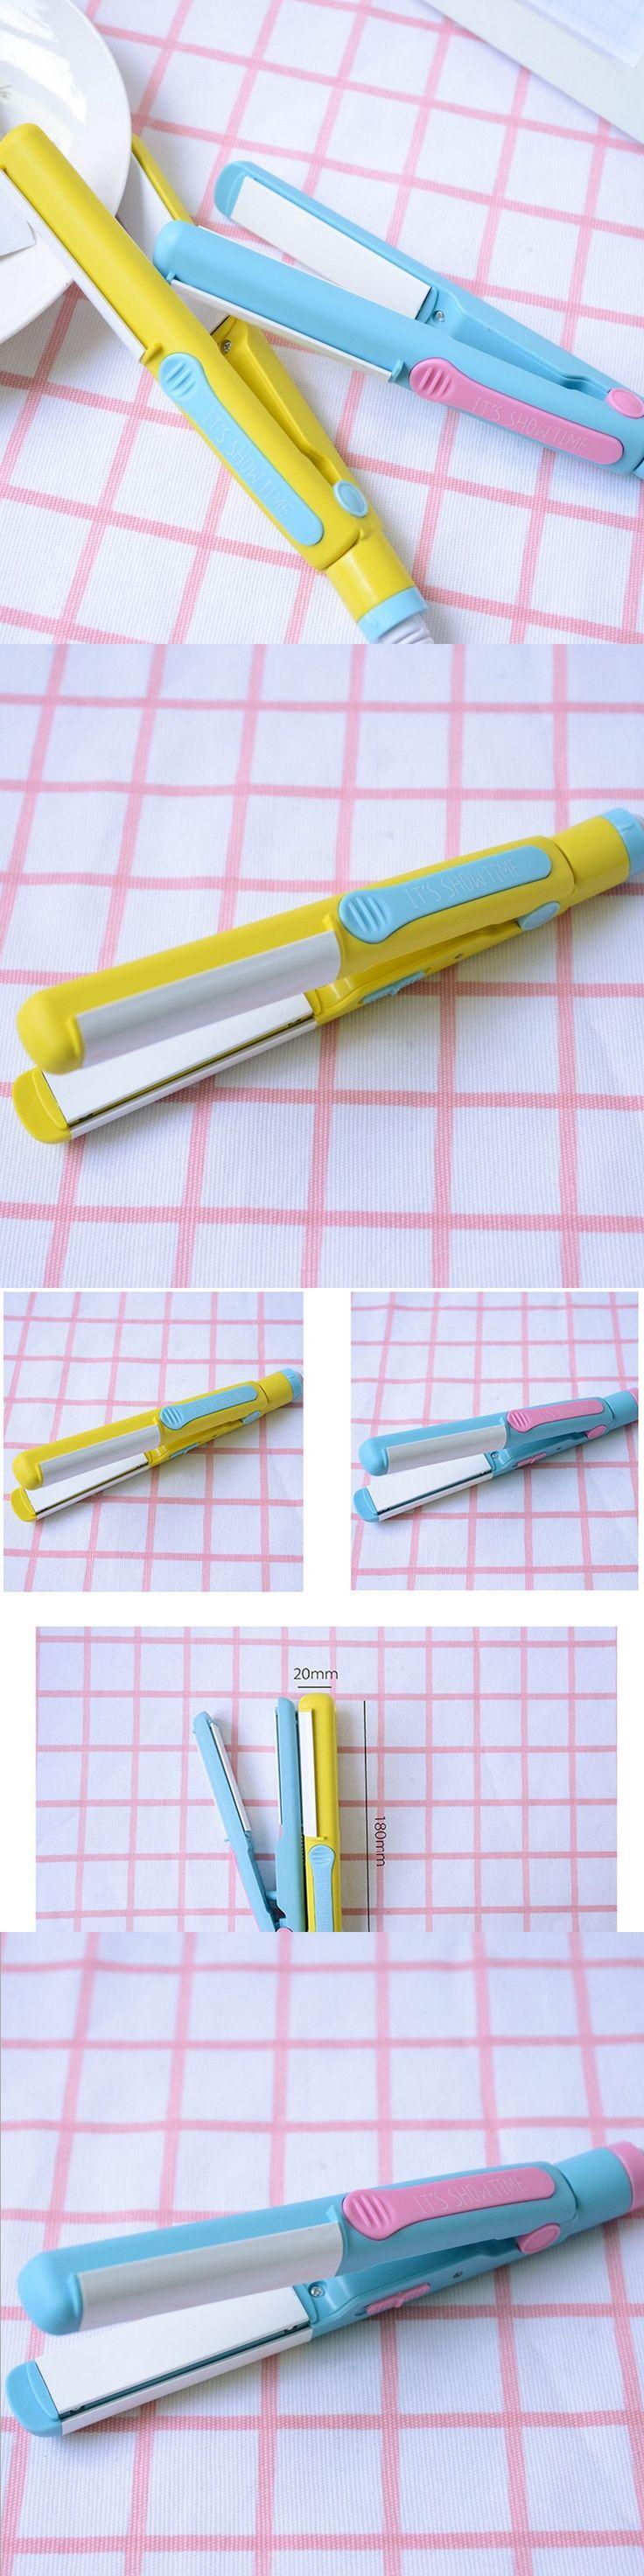 At Fashion Ceramic hair straightener Brand New Plastic Korean Design Small hair straightener and Electric hair curler 220V